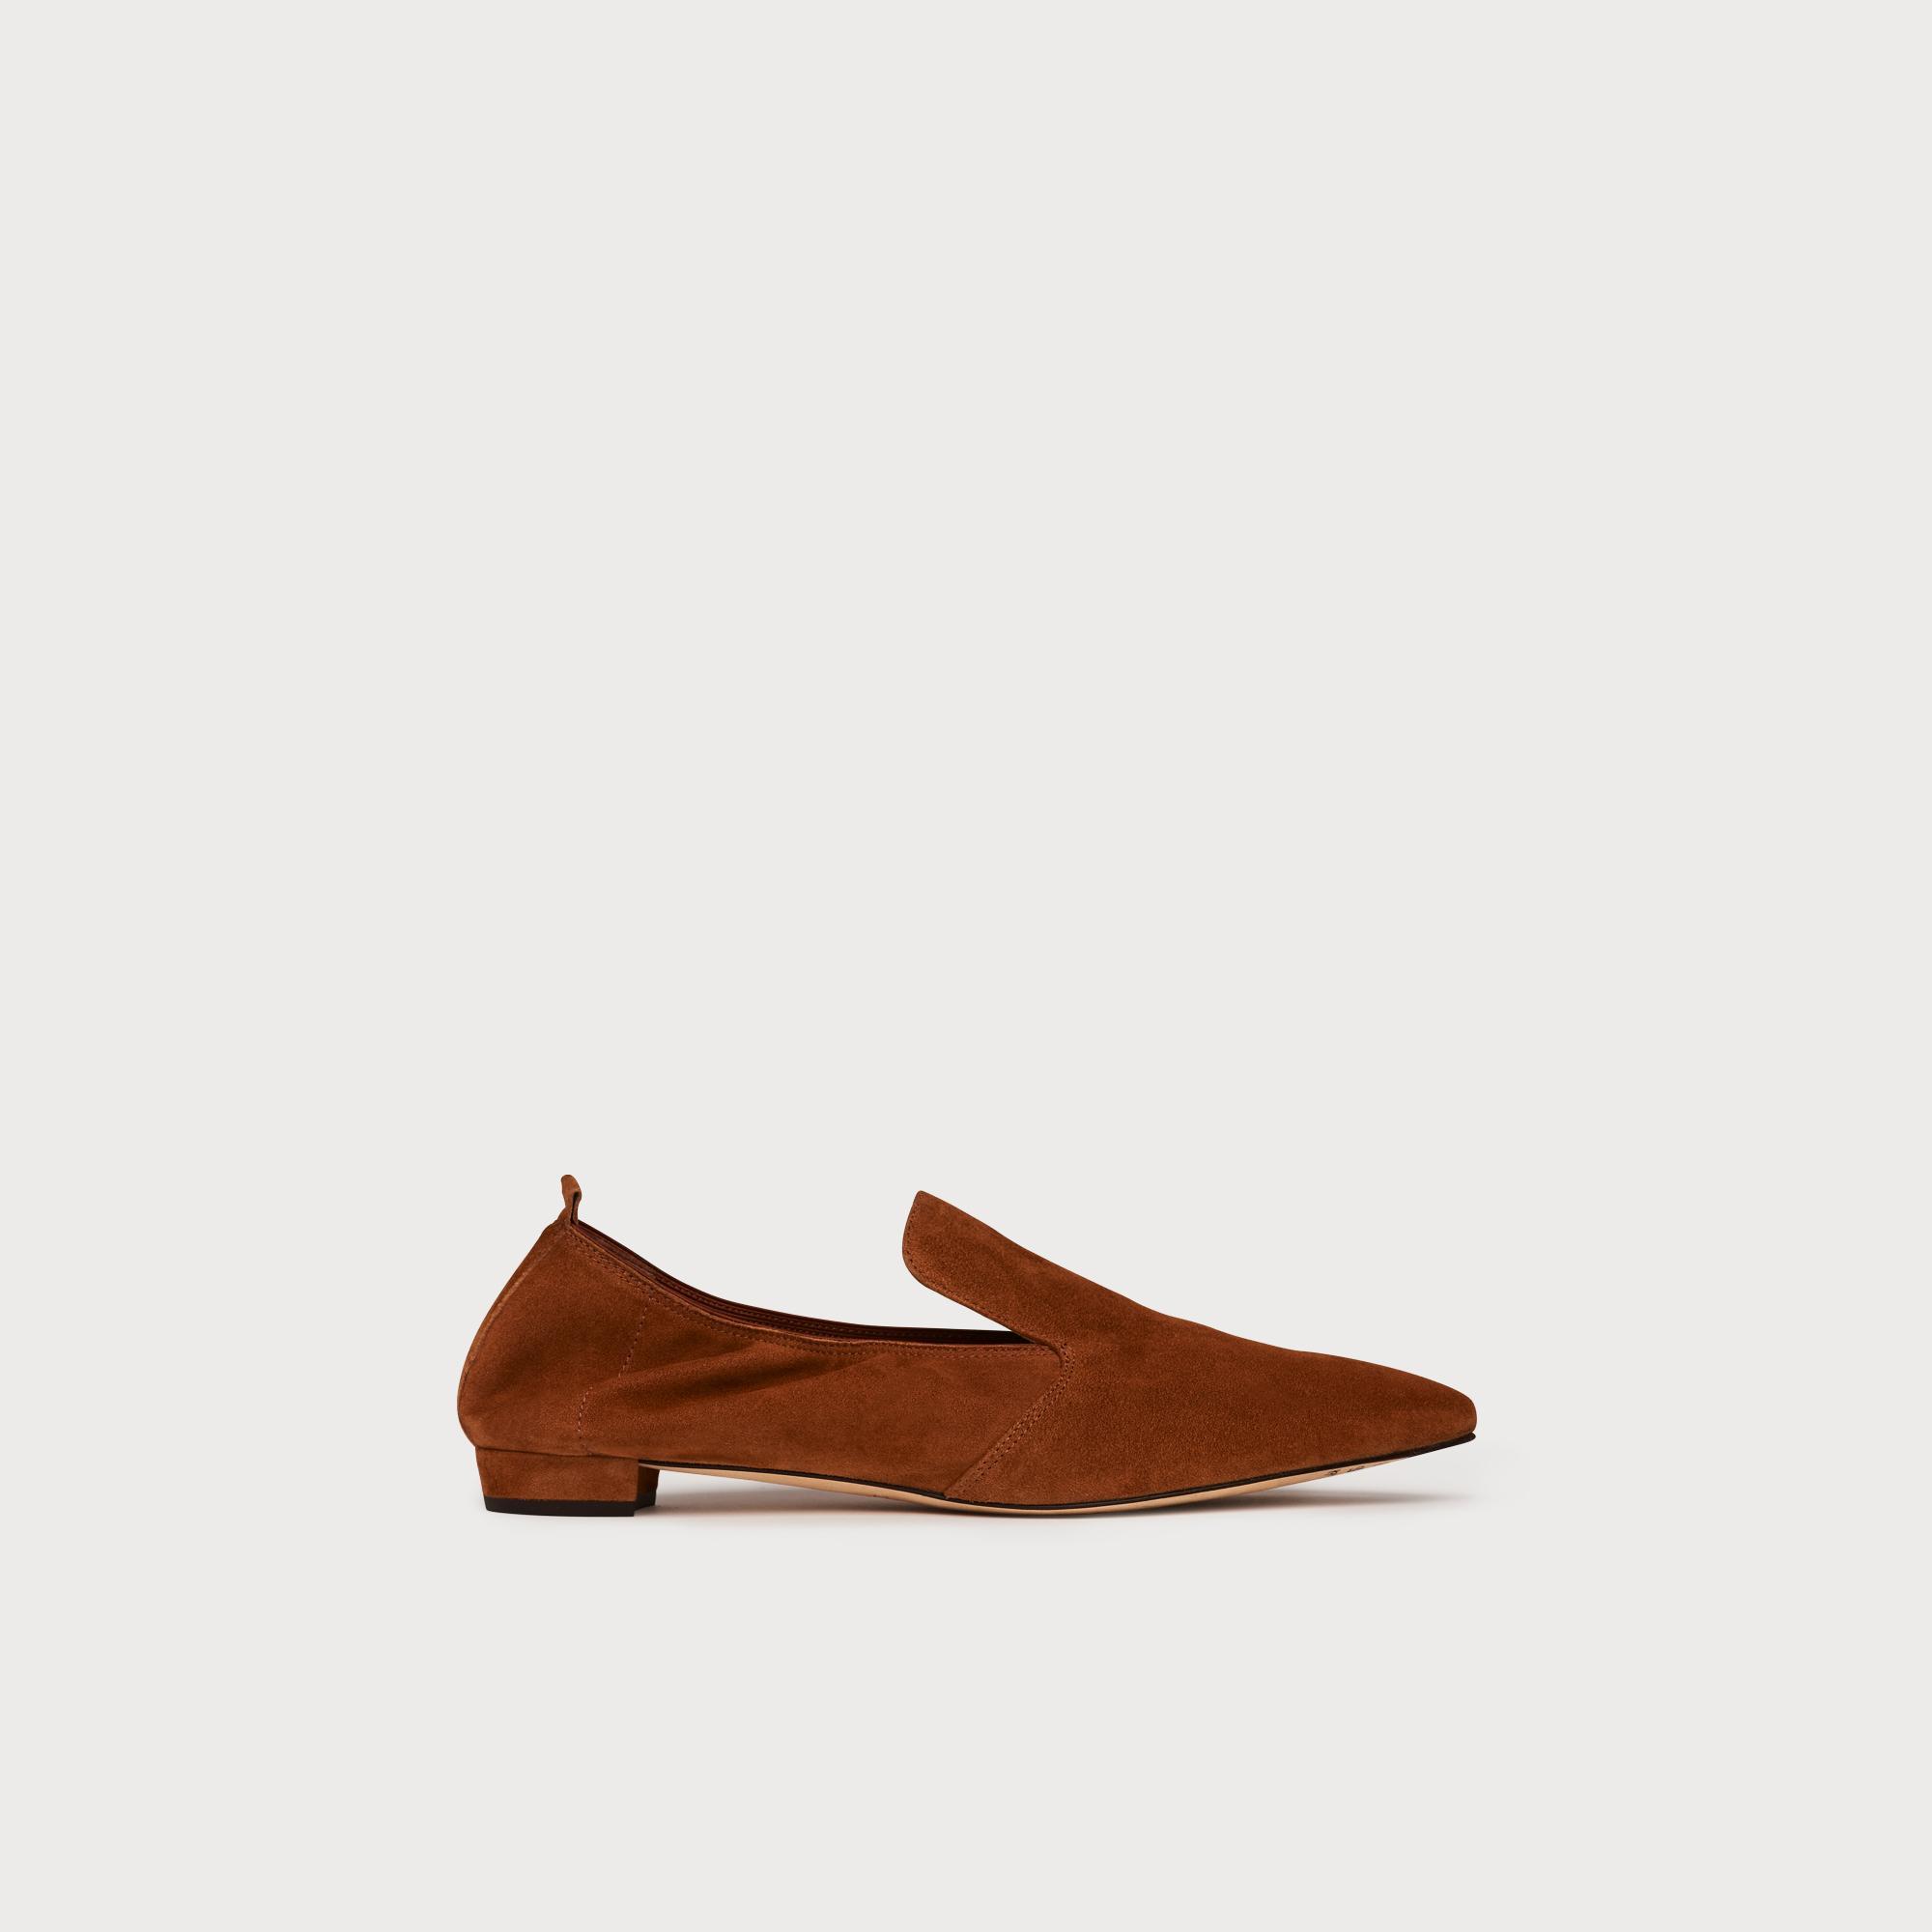 a58b7ca34 Raven Tan Suede Flats   Shoes   L.K.Bennett